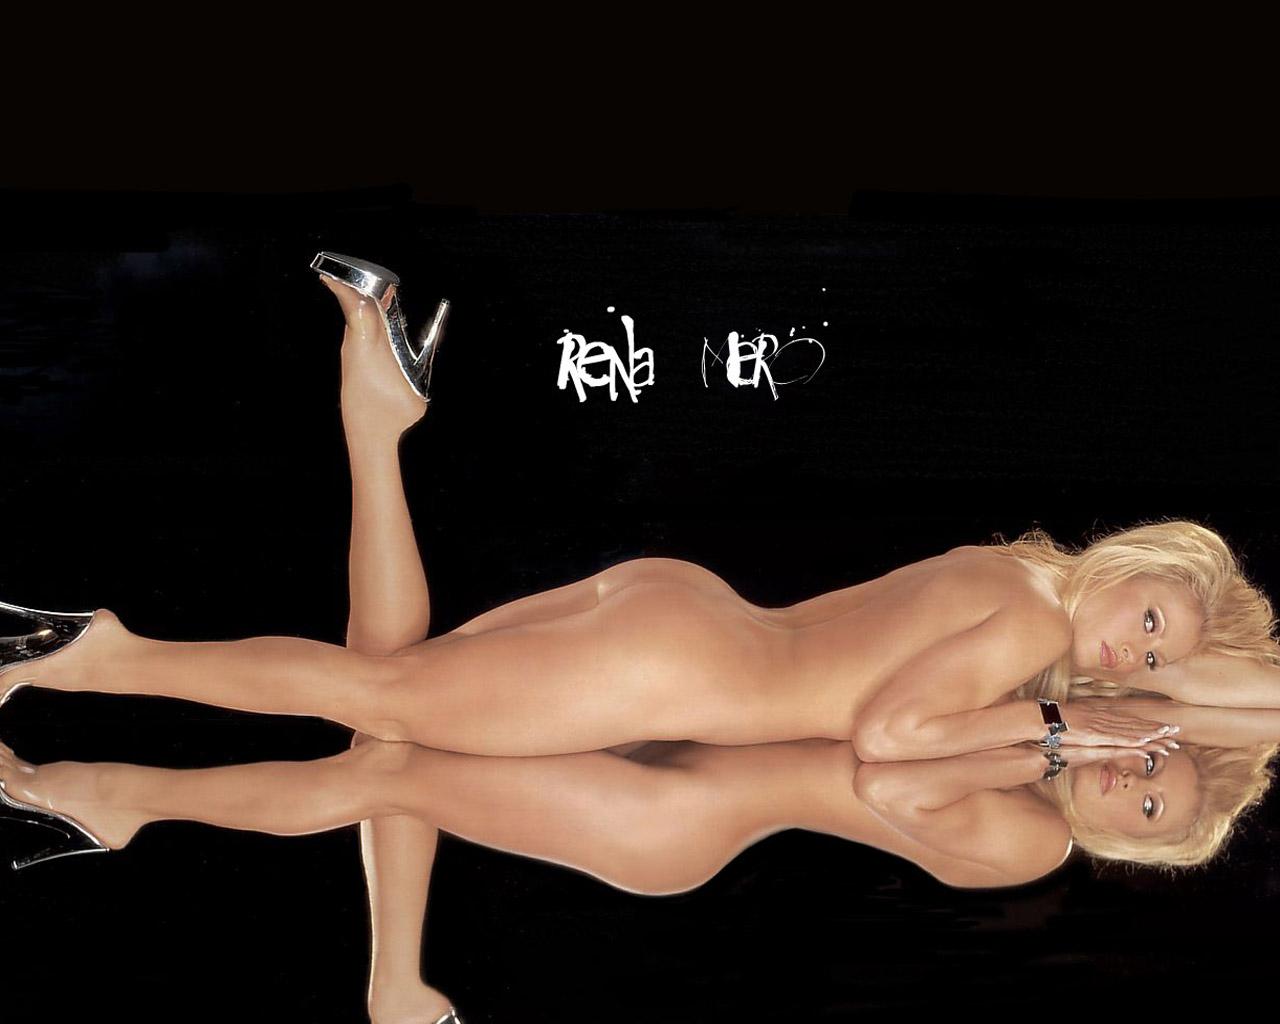 Mirrors porn wallpaper nude movie